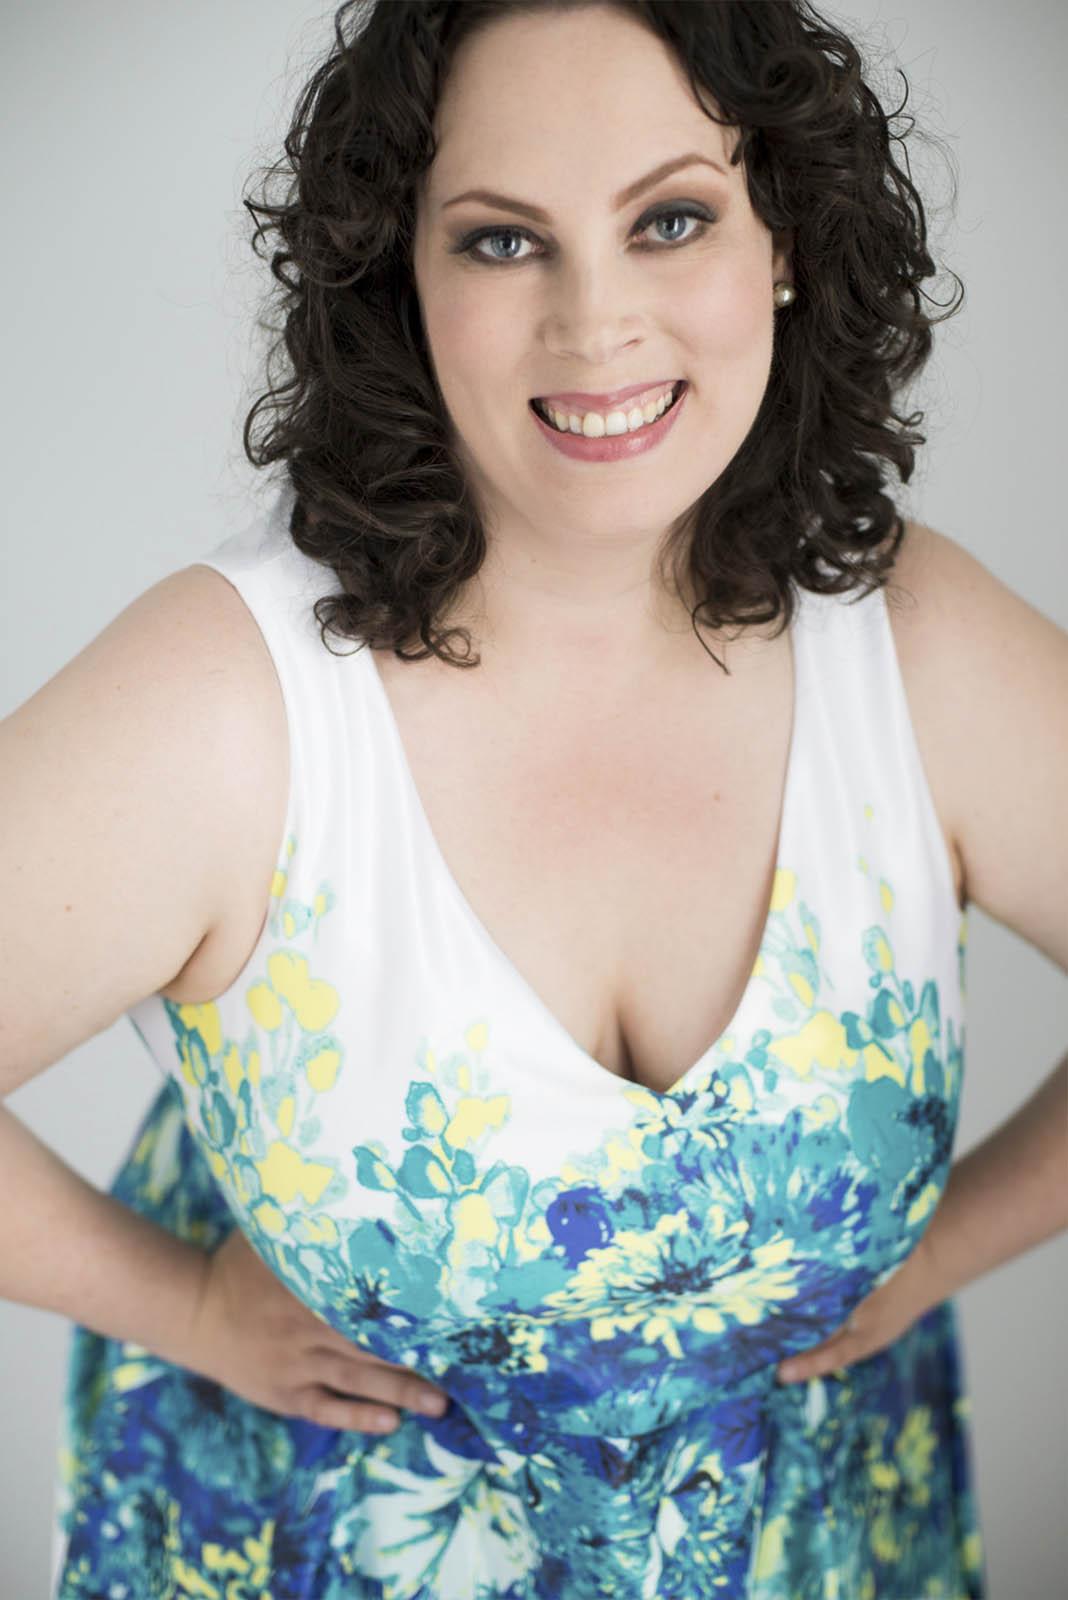 Chelsey Luren Portraits - Eating Disorder Recovery Photoshoot   Nicole Testimonial6.jpg